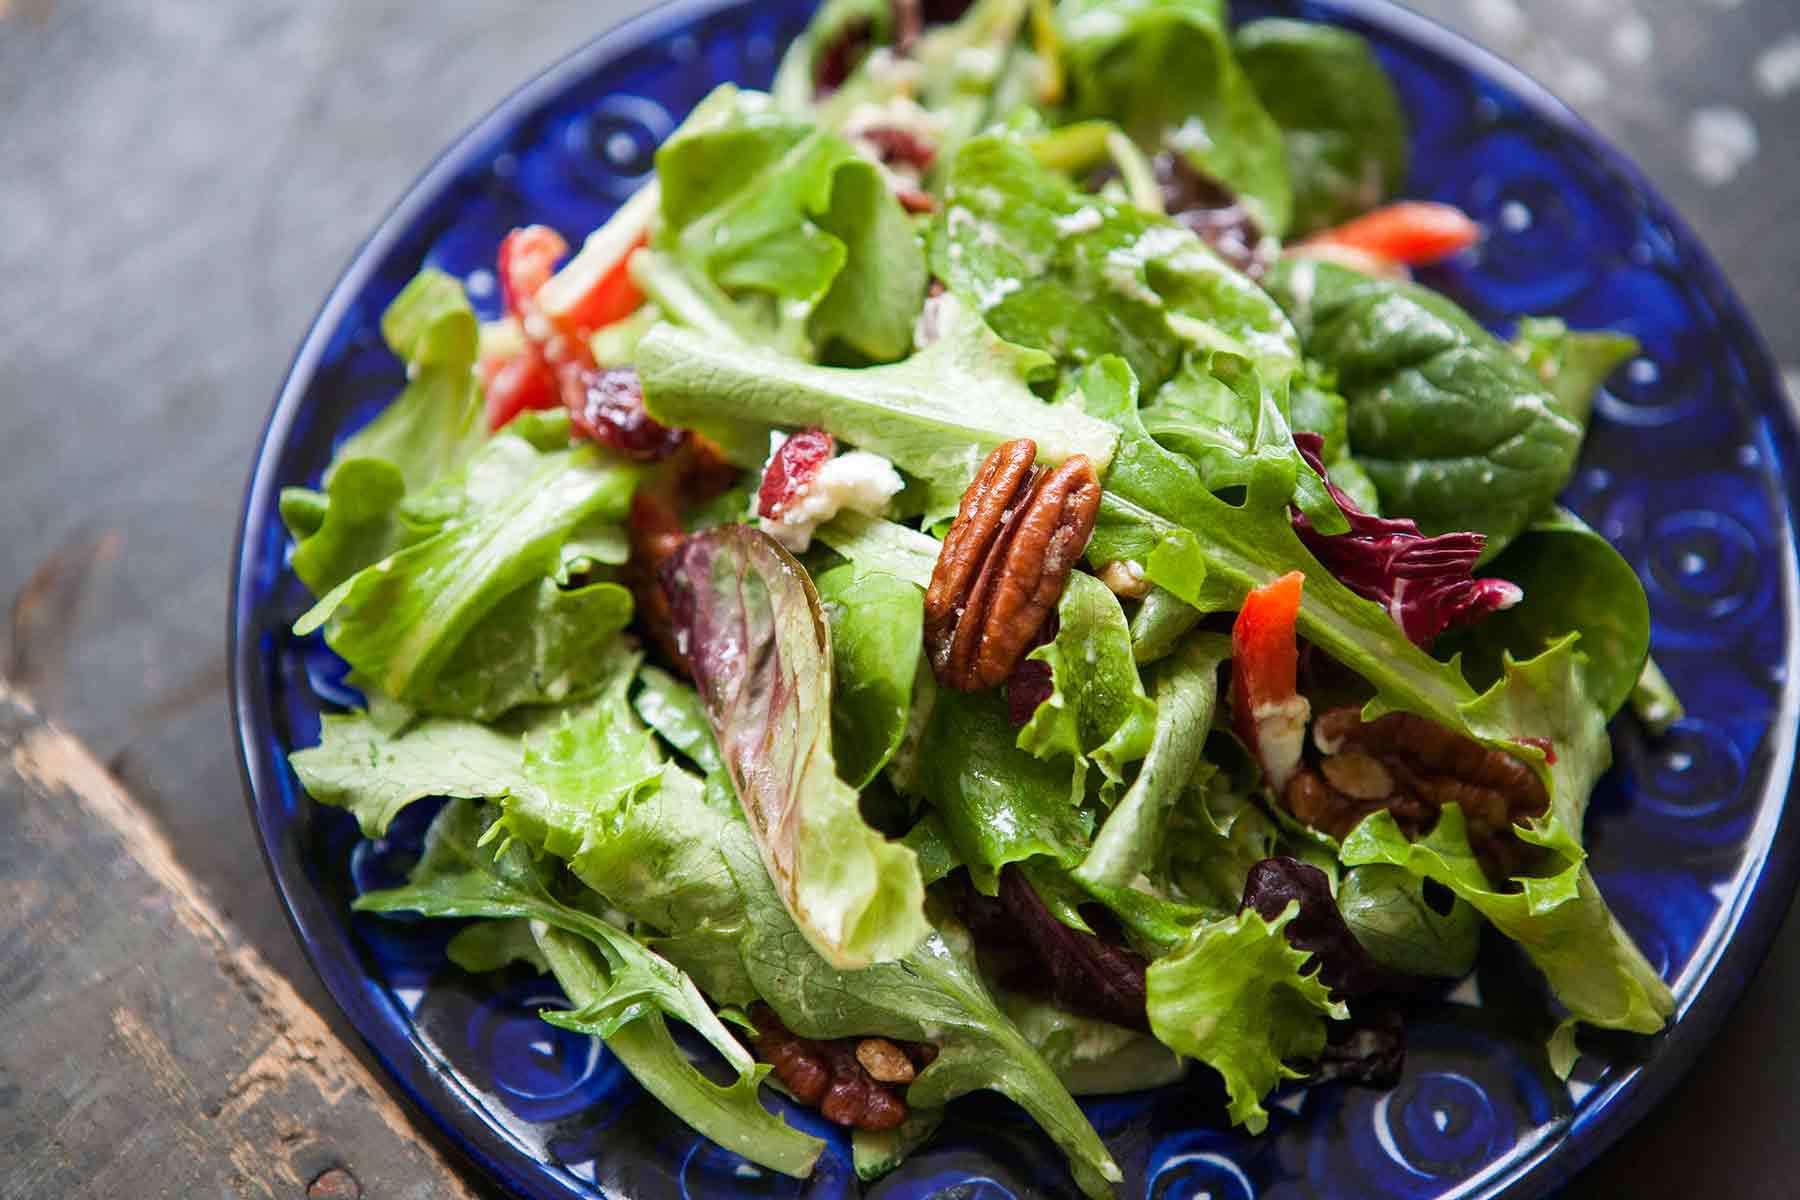 Mixed Green Salad with Pecans, Goat Cheese, Honey Mustard Vinaigrette